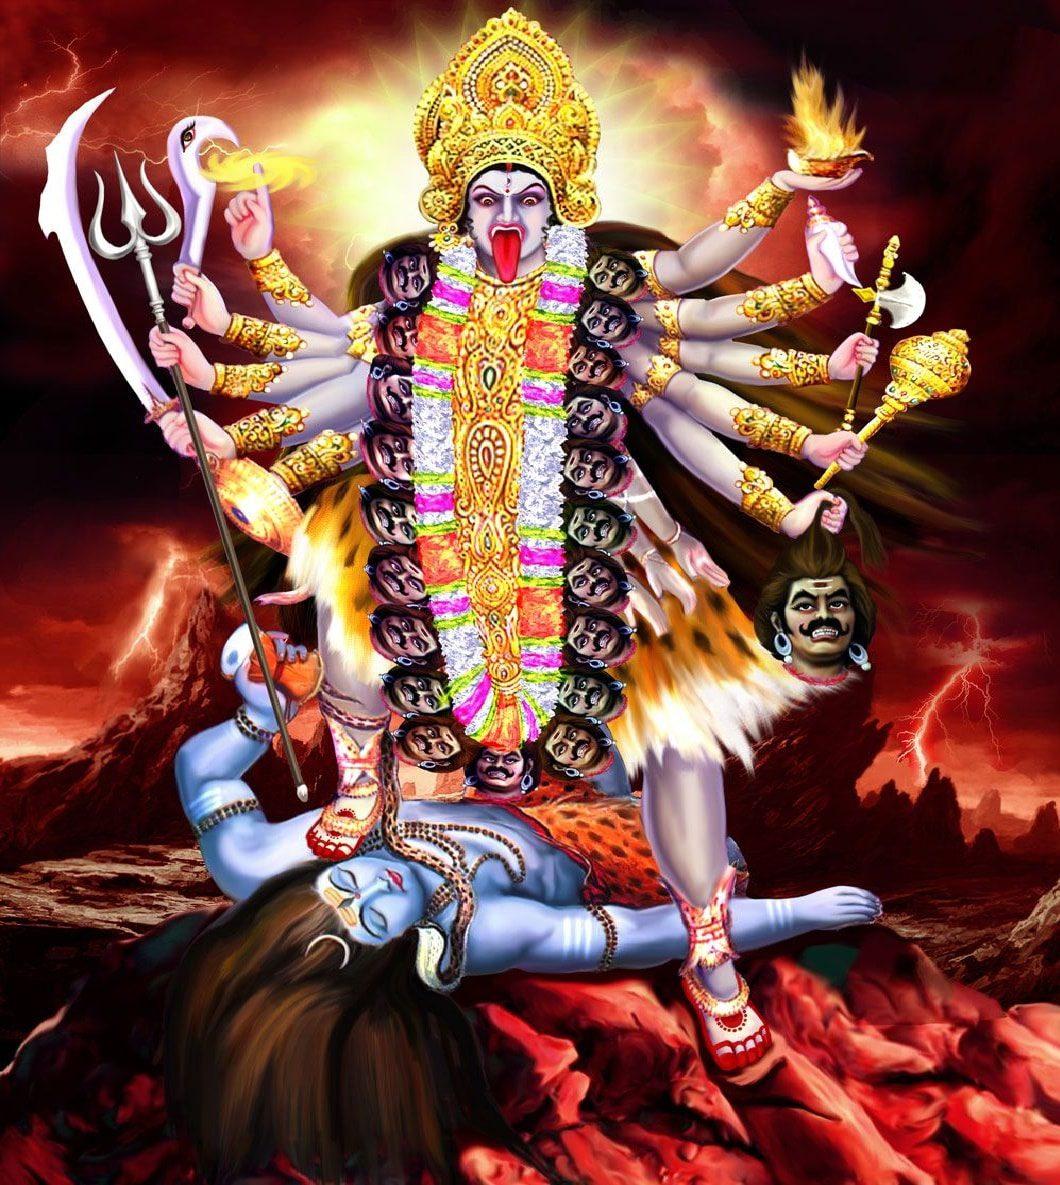 La Diosa Kali